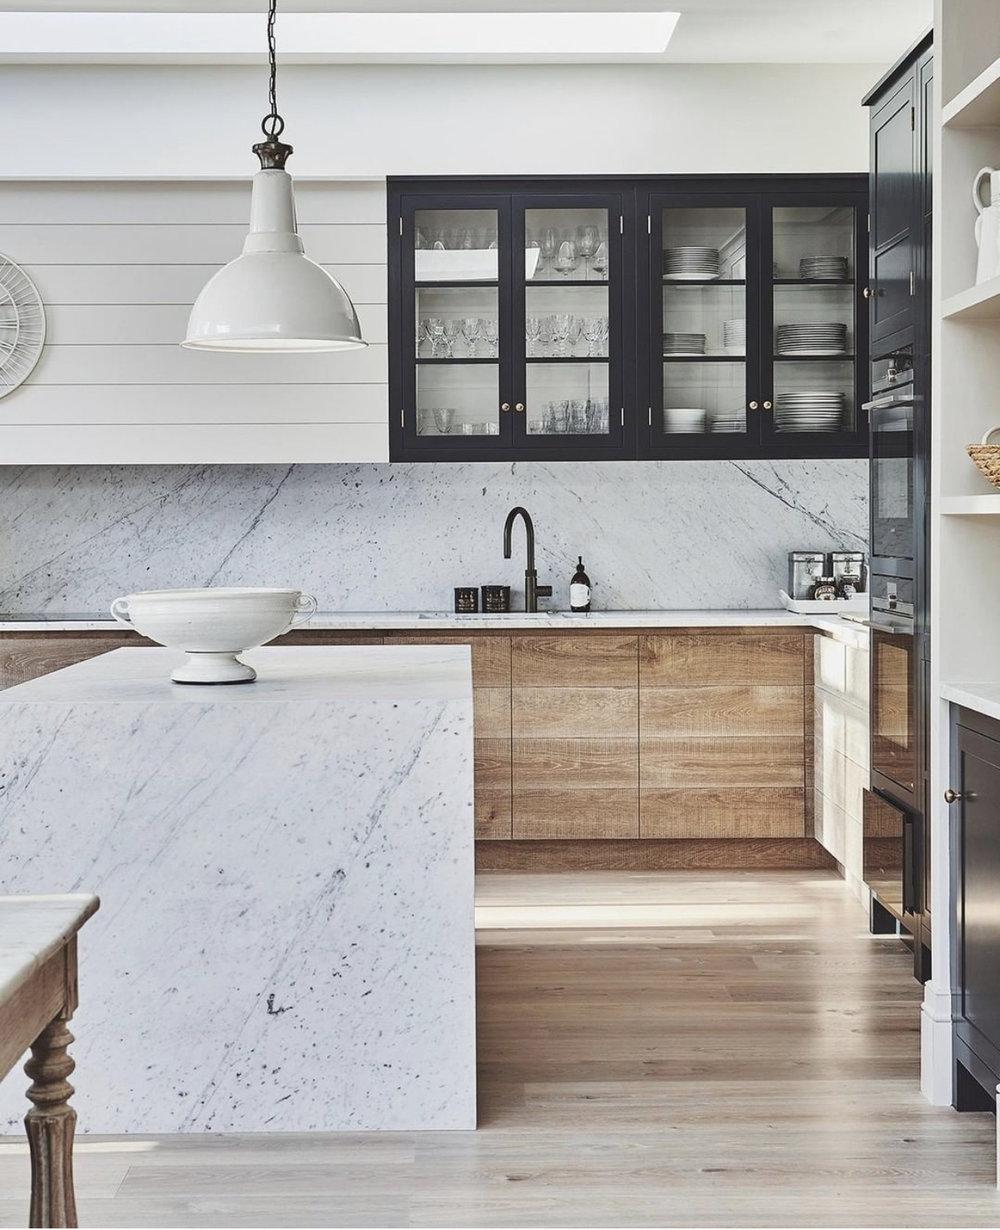 Design by Blakes London